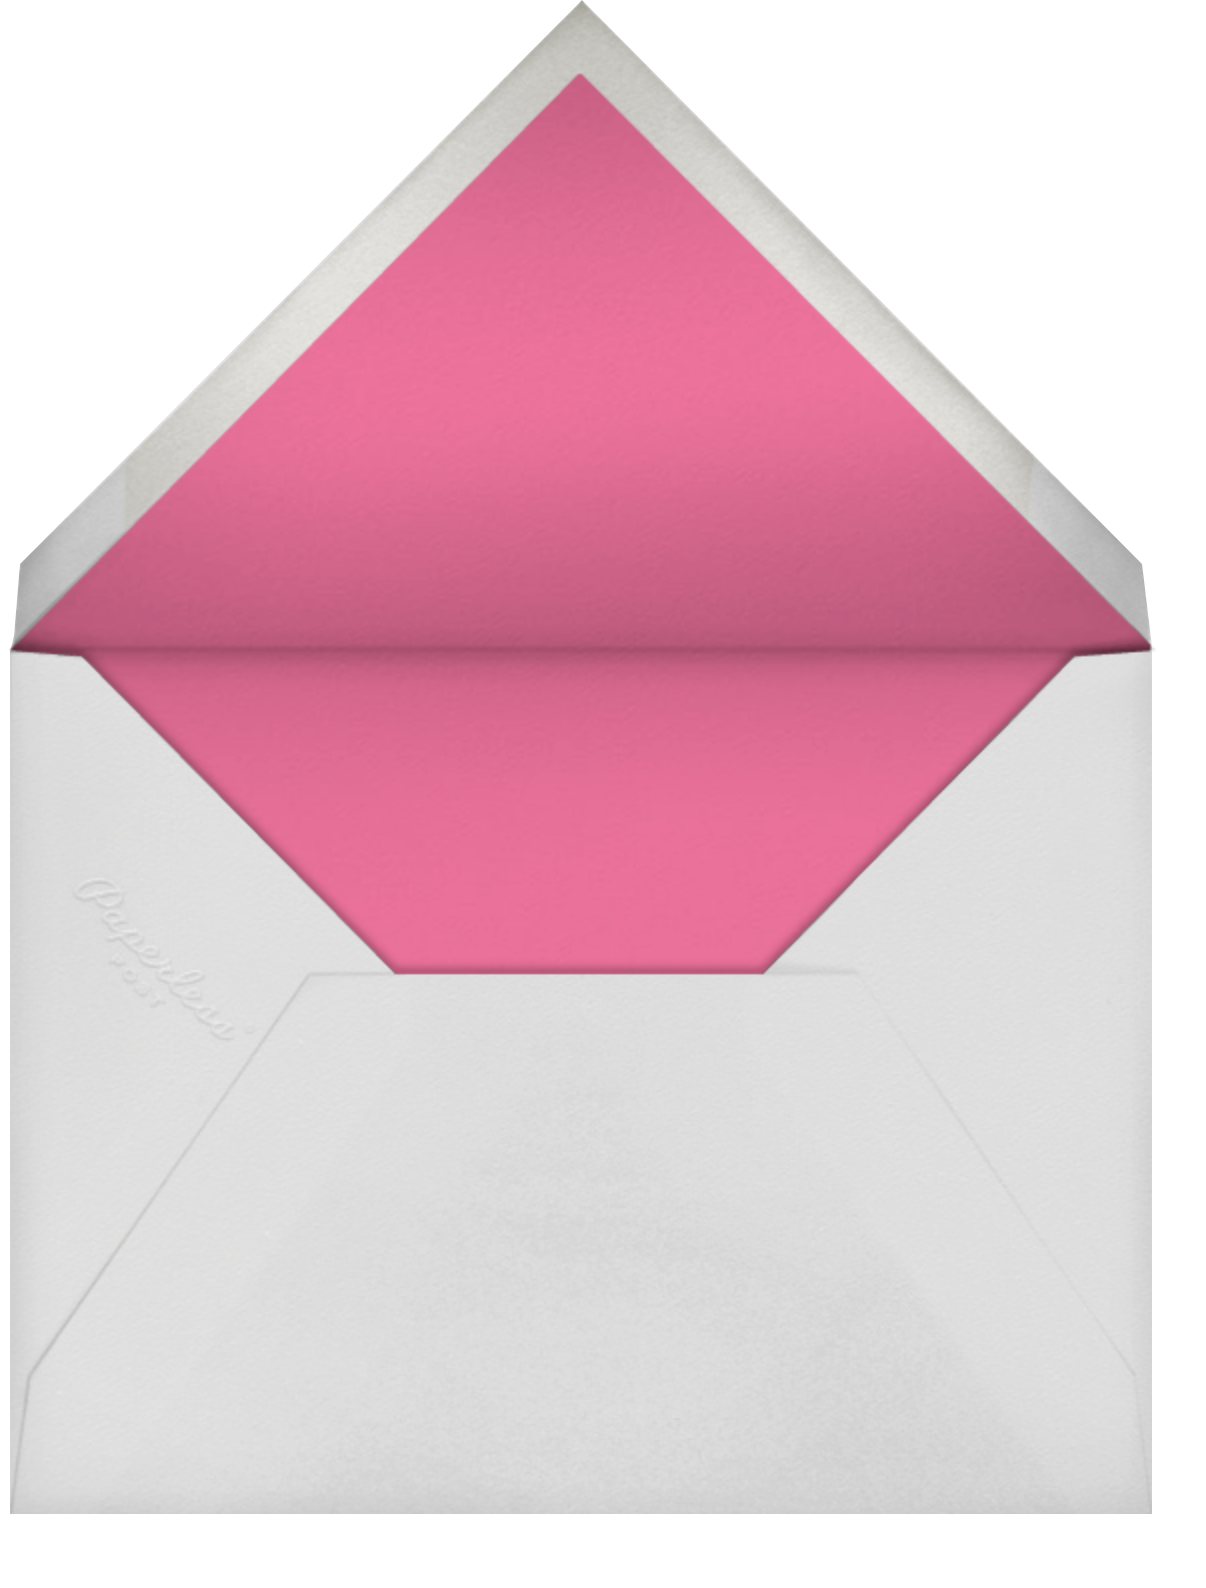 Llama with Balloons - Gray Malin - Western party invitations - envelope back